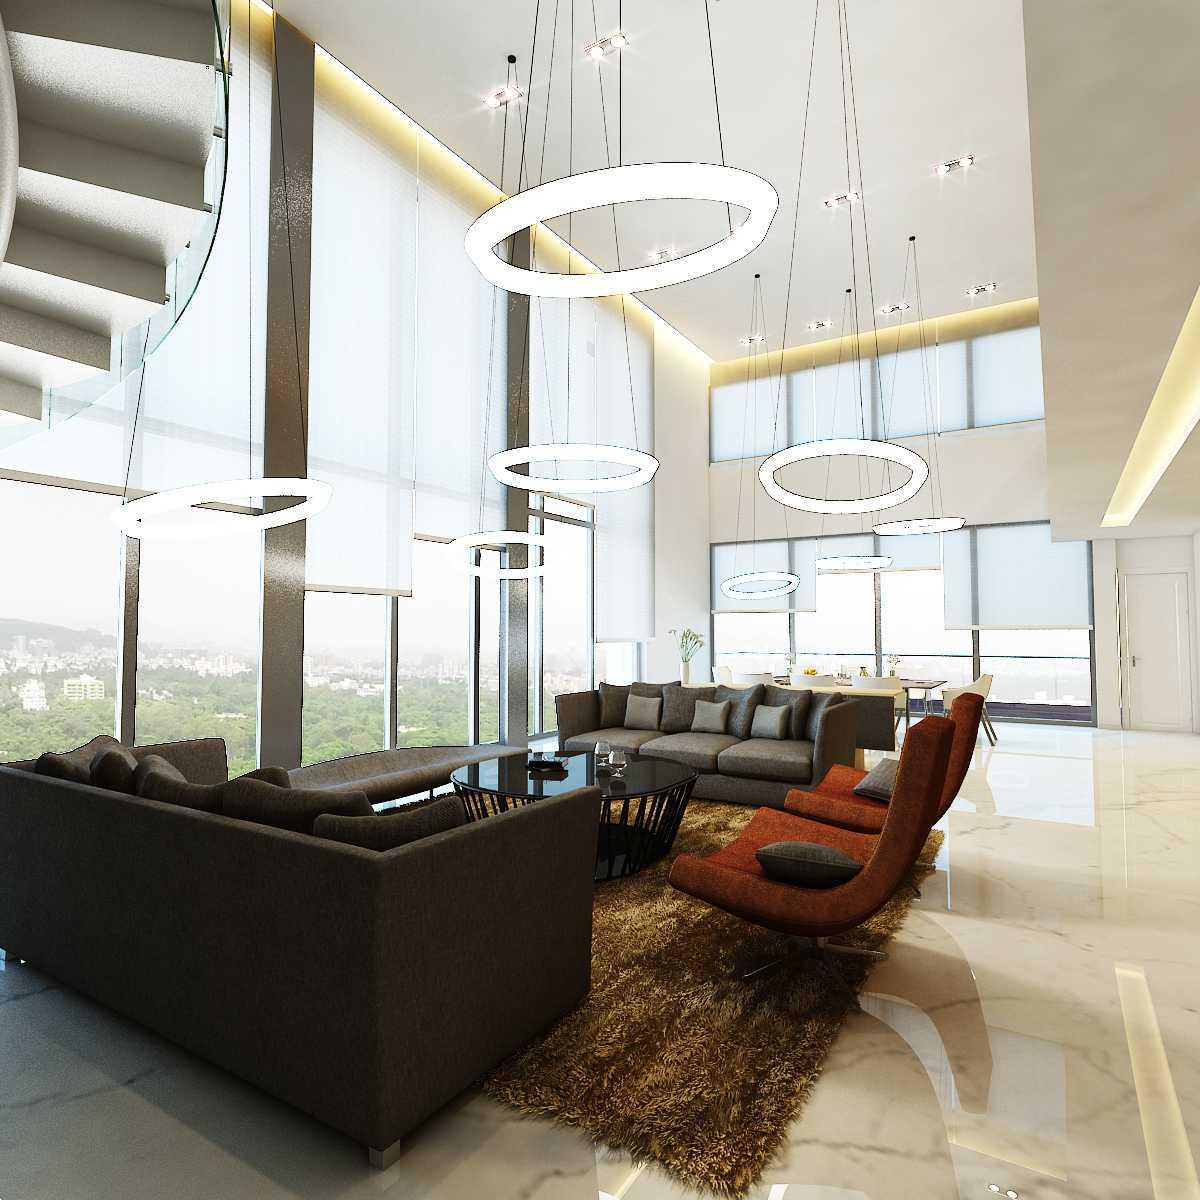 Saka Design Lab Private Residential _ 2 Dhanori Lohagaon Rd, Kutwal Colony, Lohgaon, Pune, Maharashtra 412105, India India Ashish-C3 Modern  34988